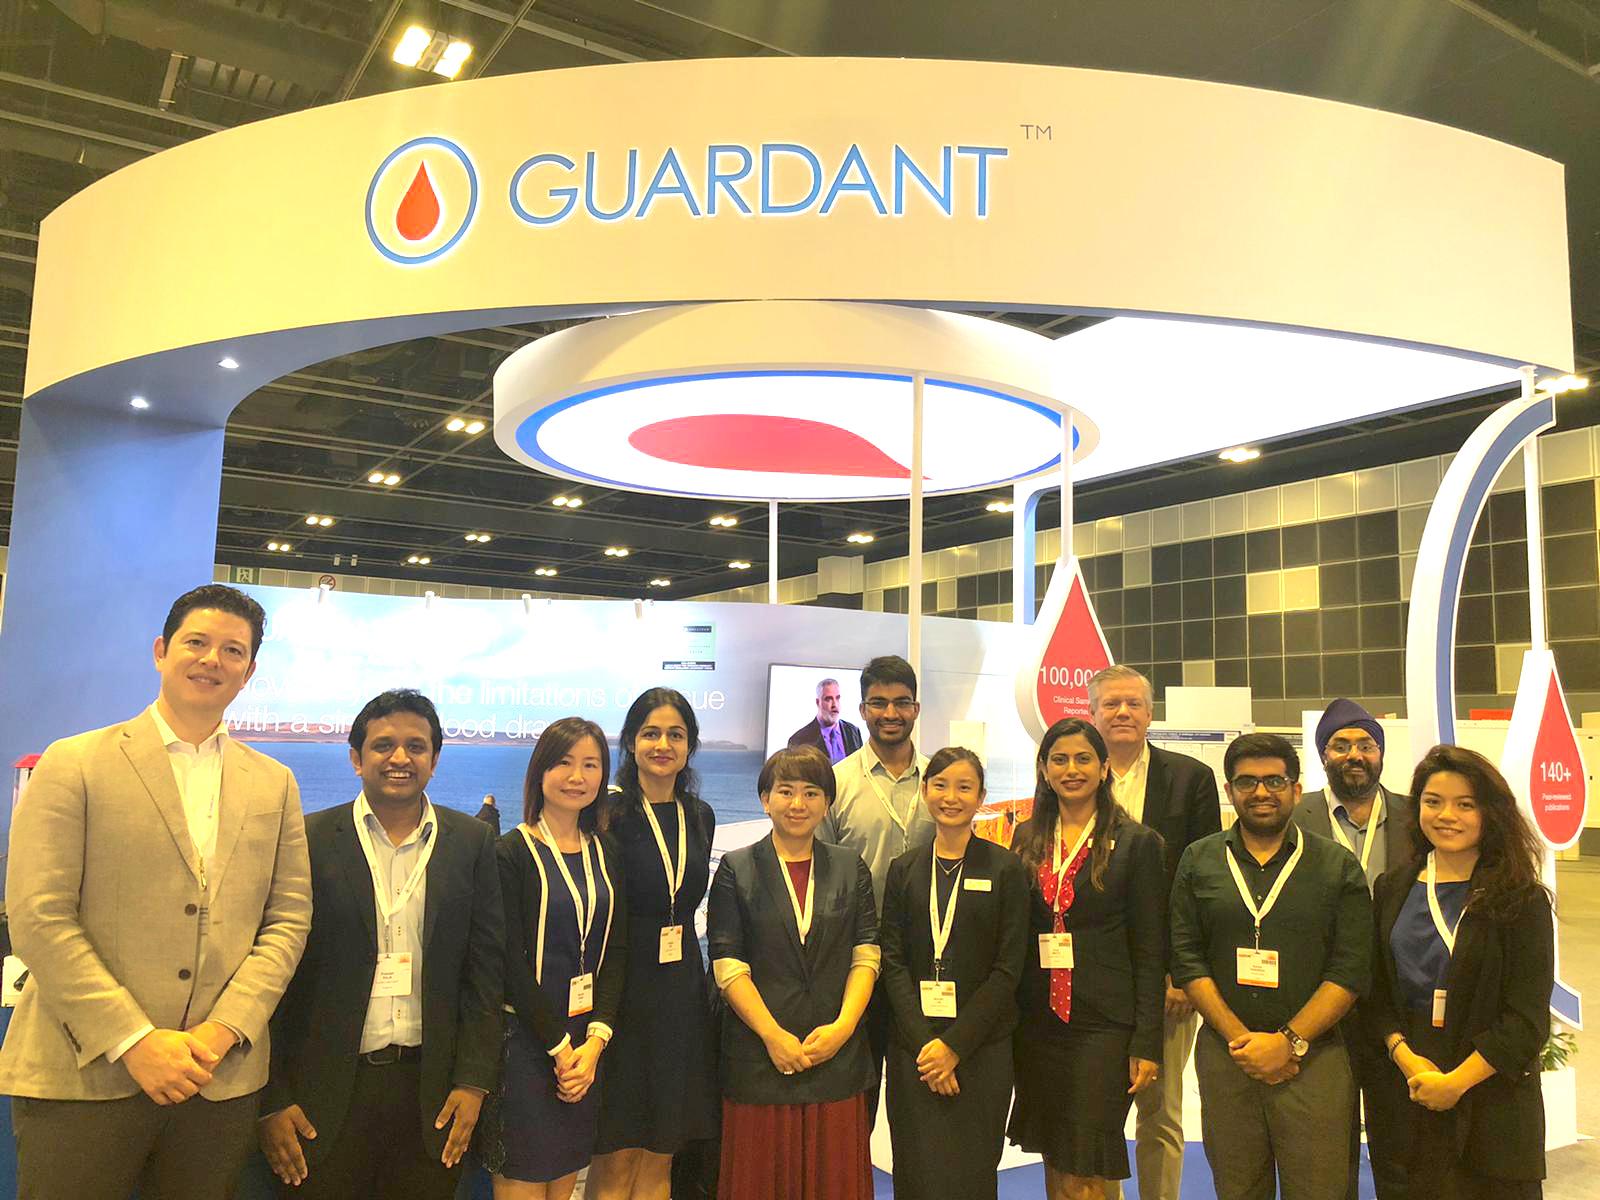 The GH AMEA Team at ESMO Asia 2019 in Suntec City Singapore.